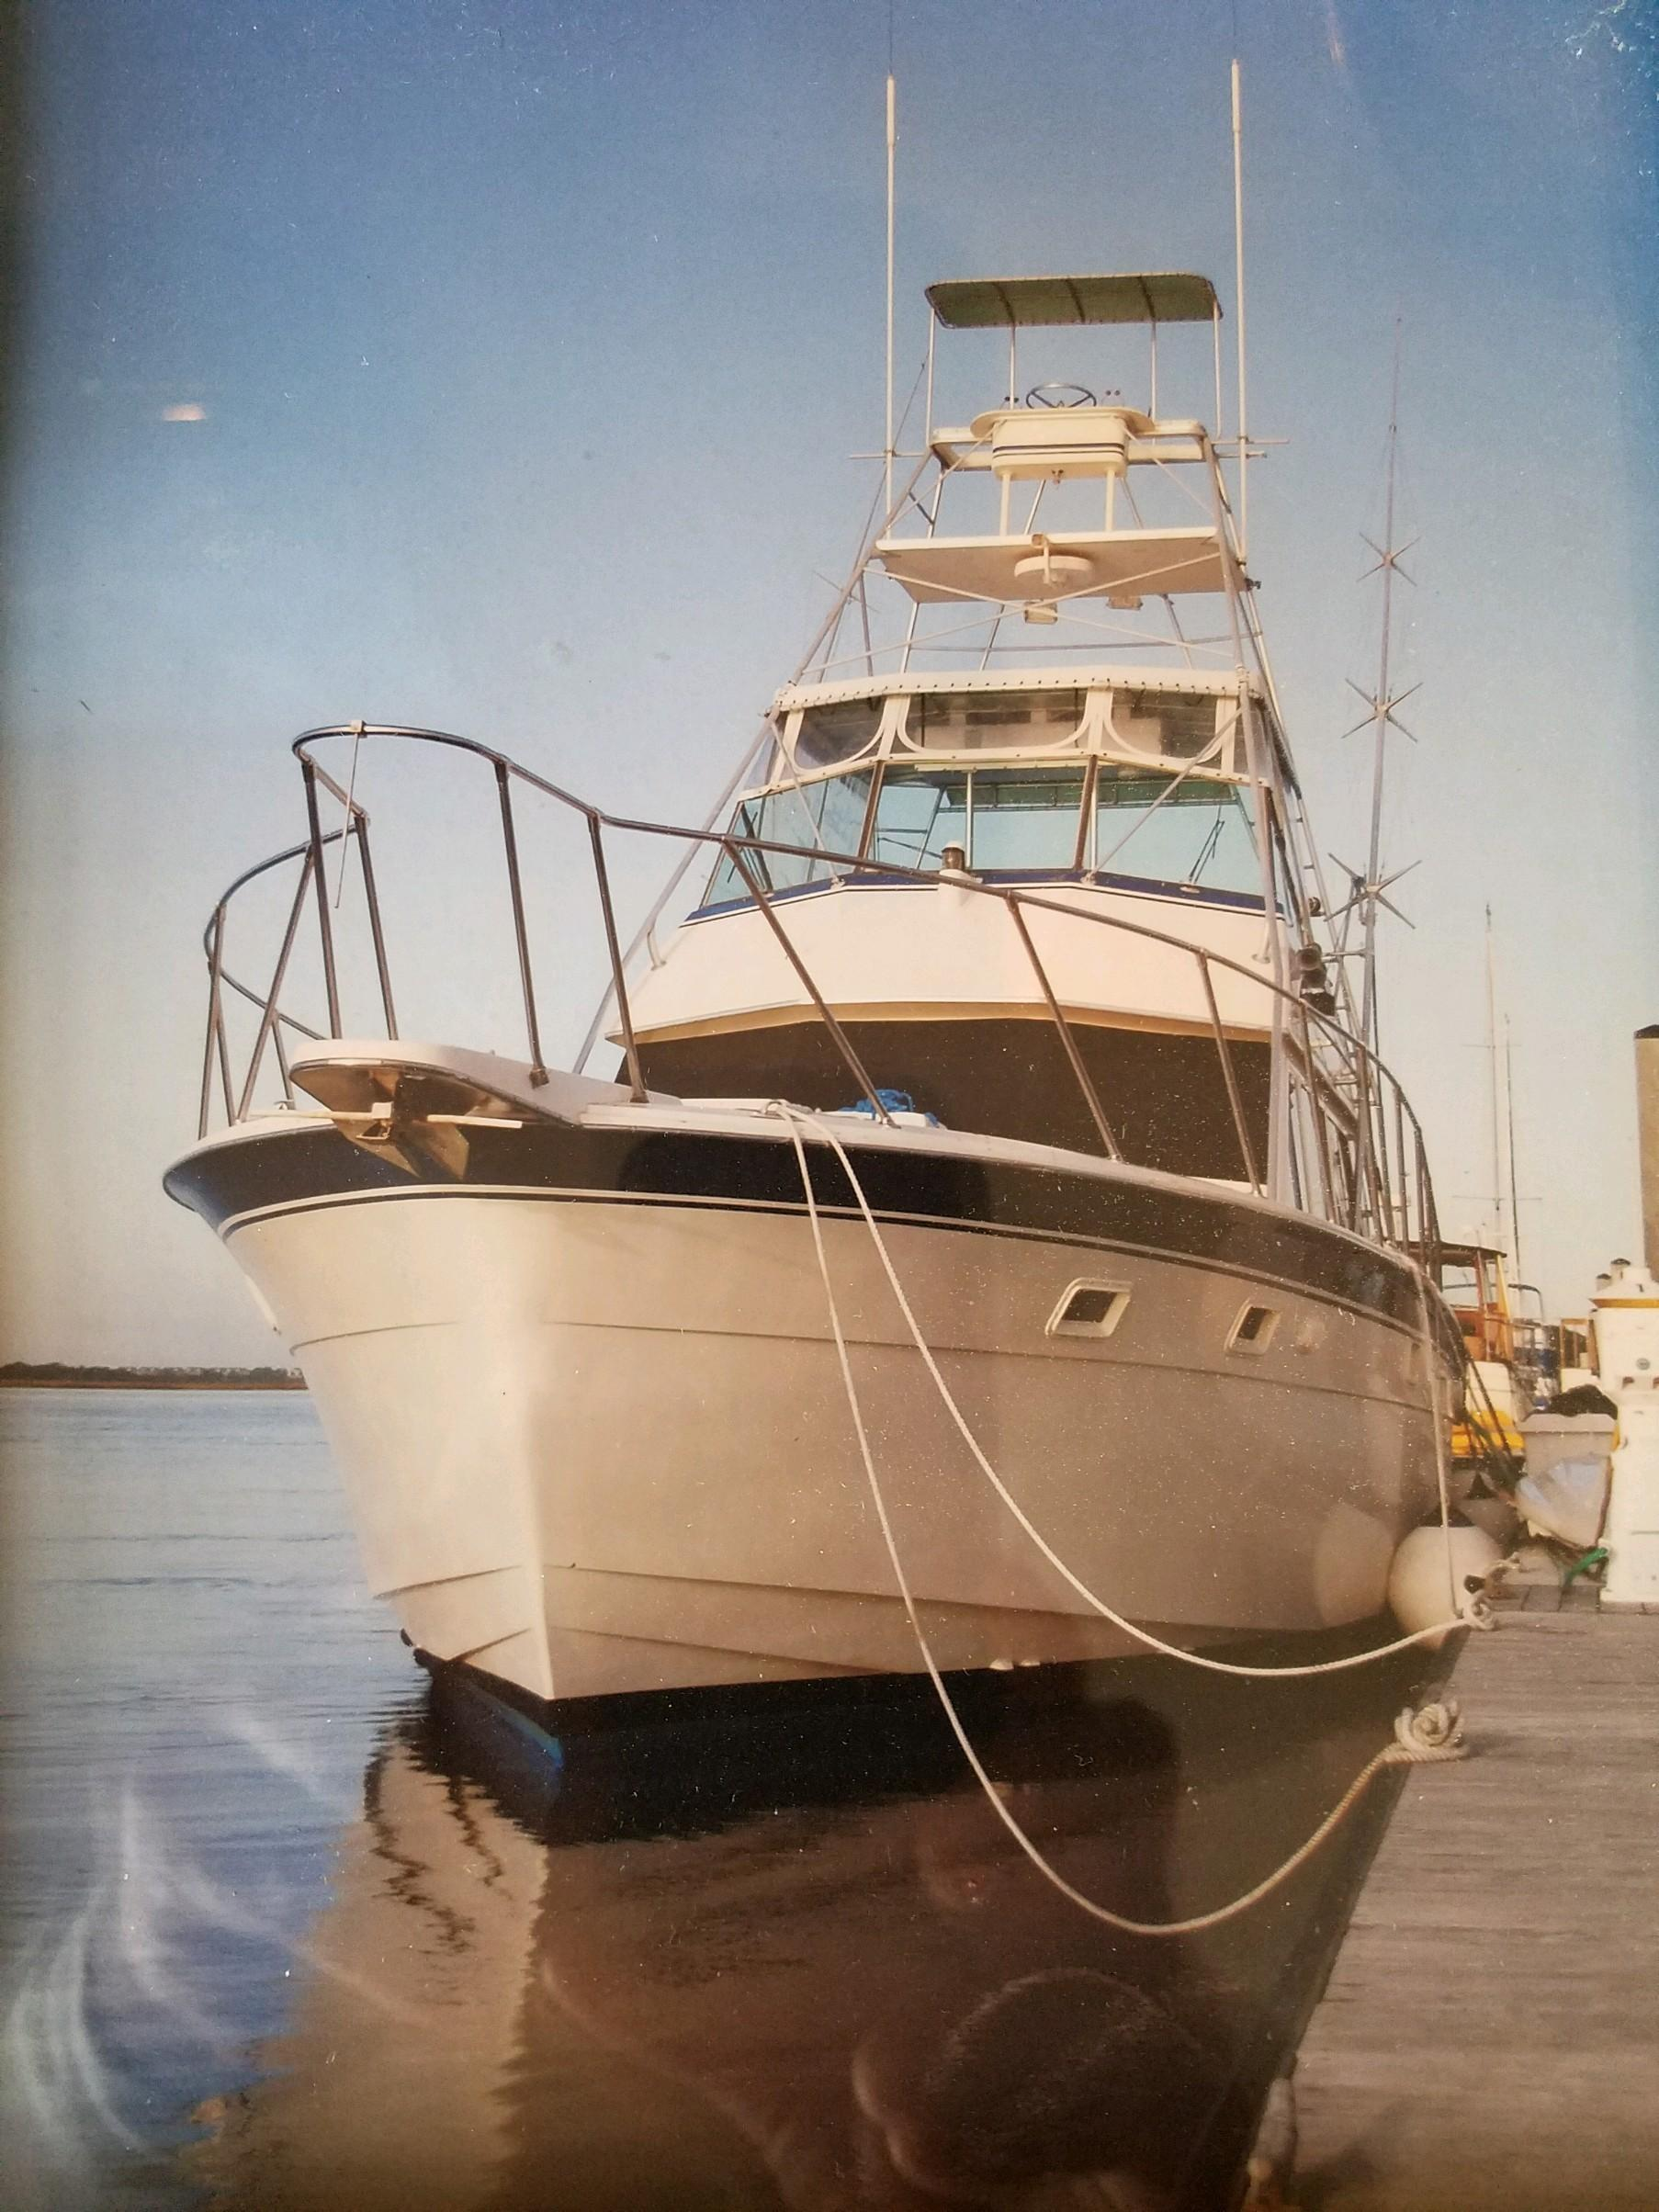 Hatteras Convertible - MUST SEE - Dockside